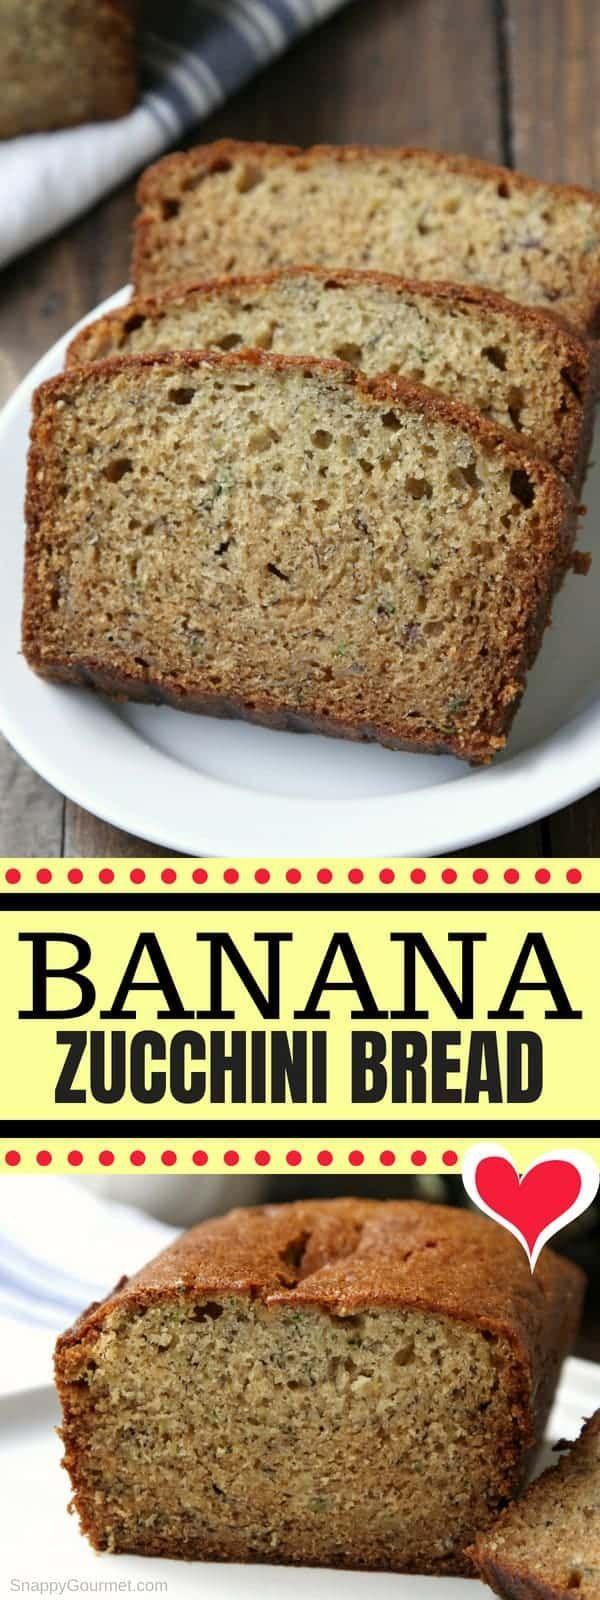 Banana Zucchini Bread, or Zucchini Banana Bread, is a moist, easy, quick bread r... -  #banan... #bananabreadbrownies